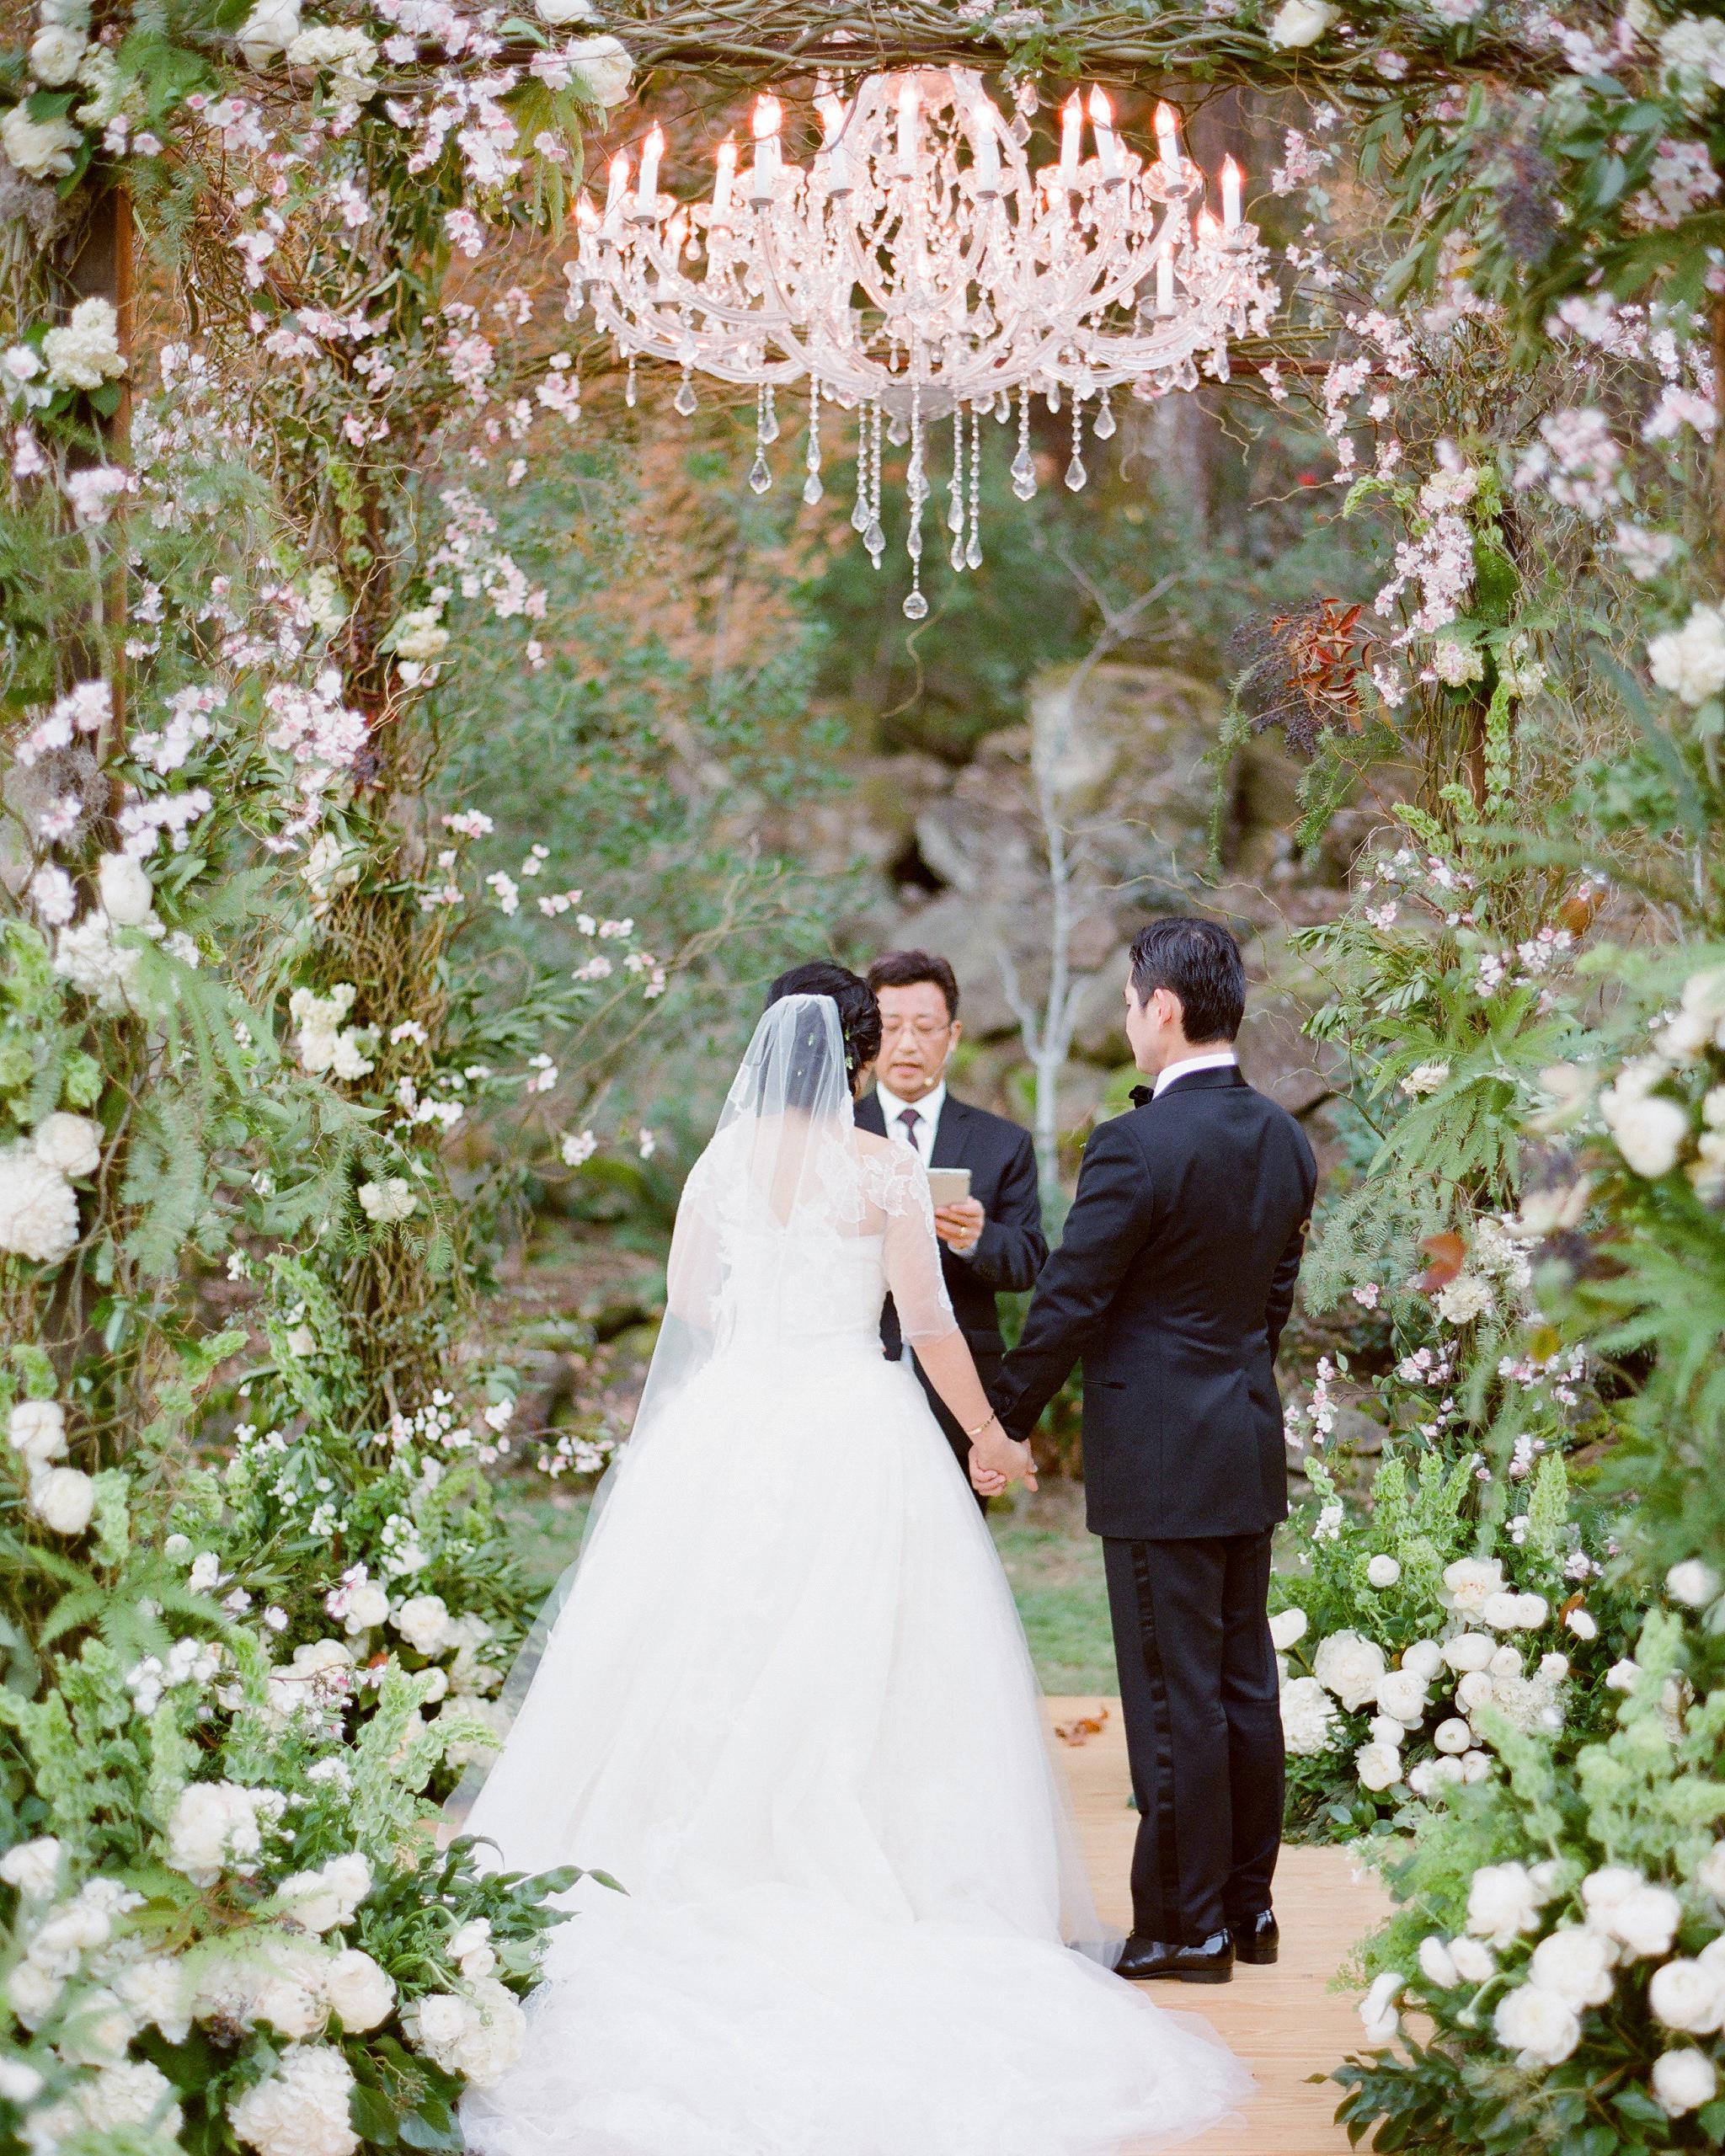 adriana-han-wedding-57540002-s111814.jpg